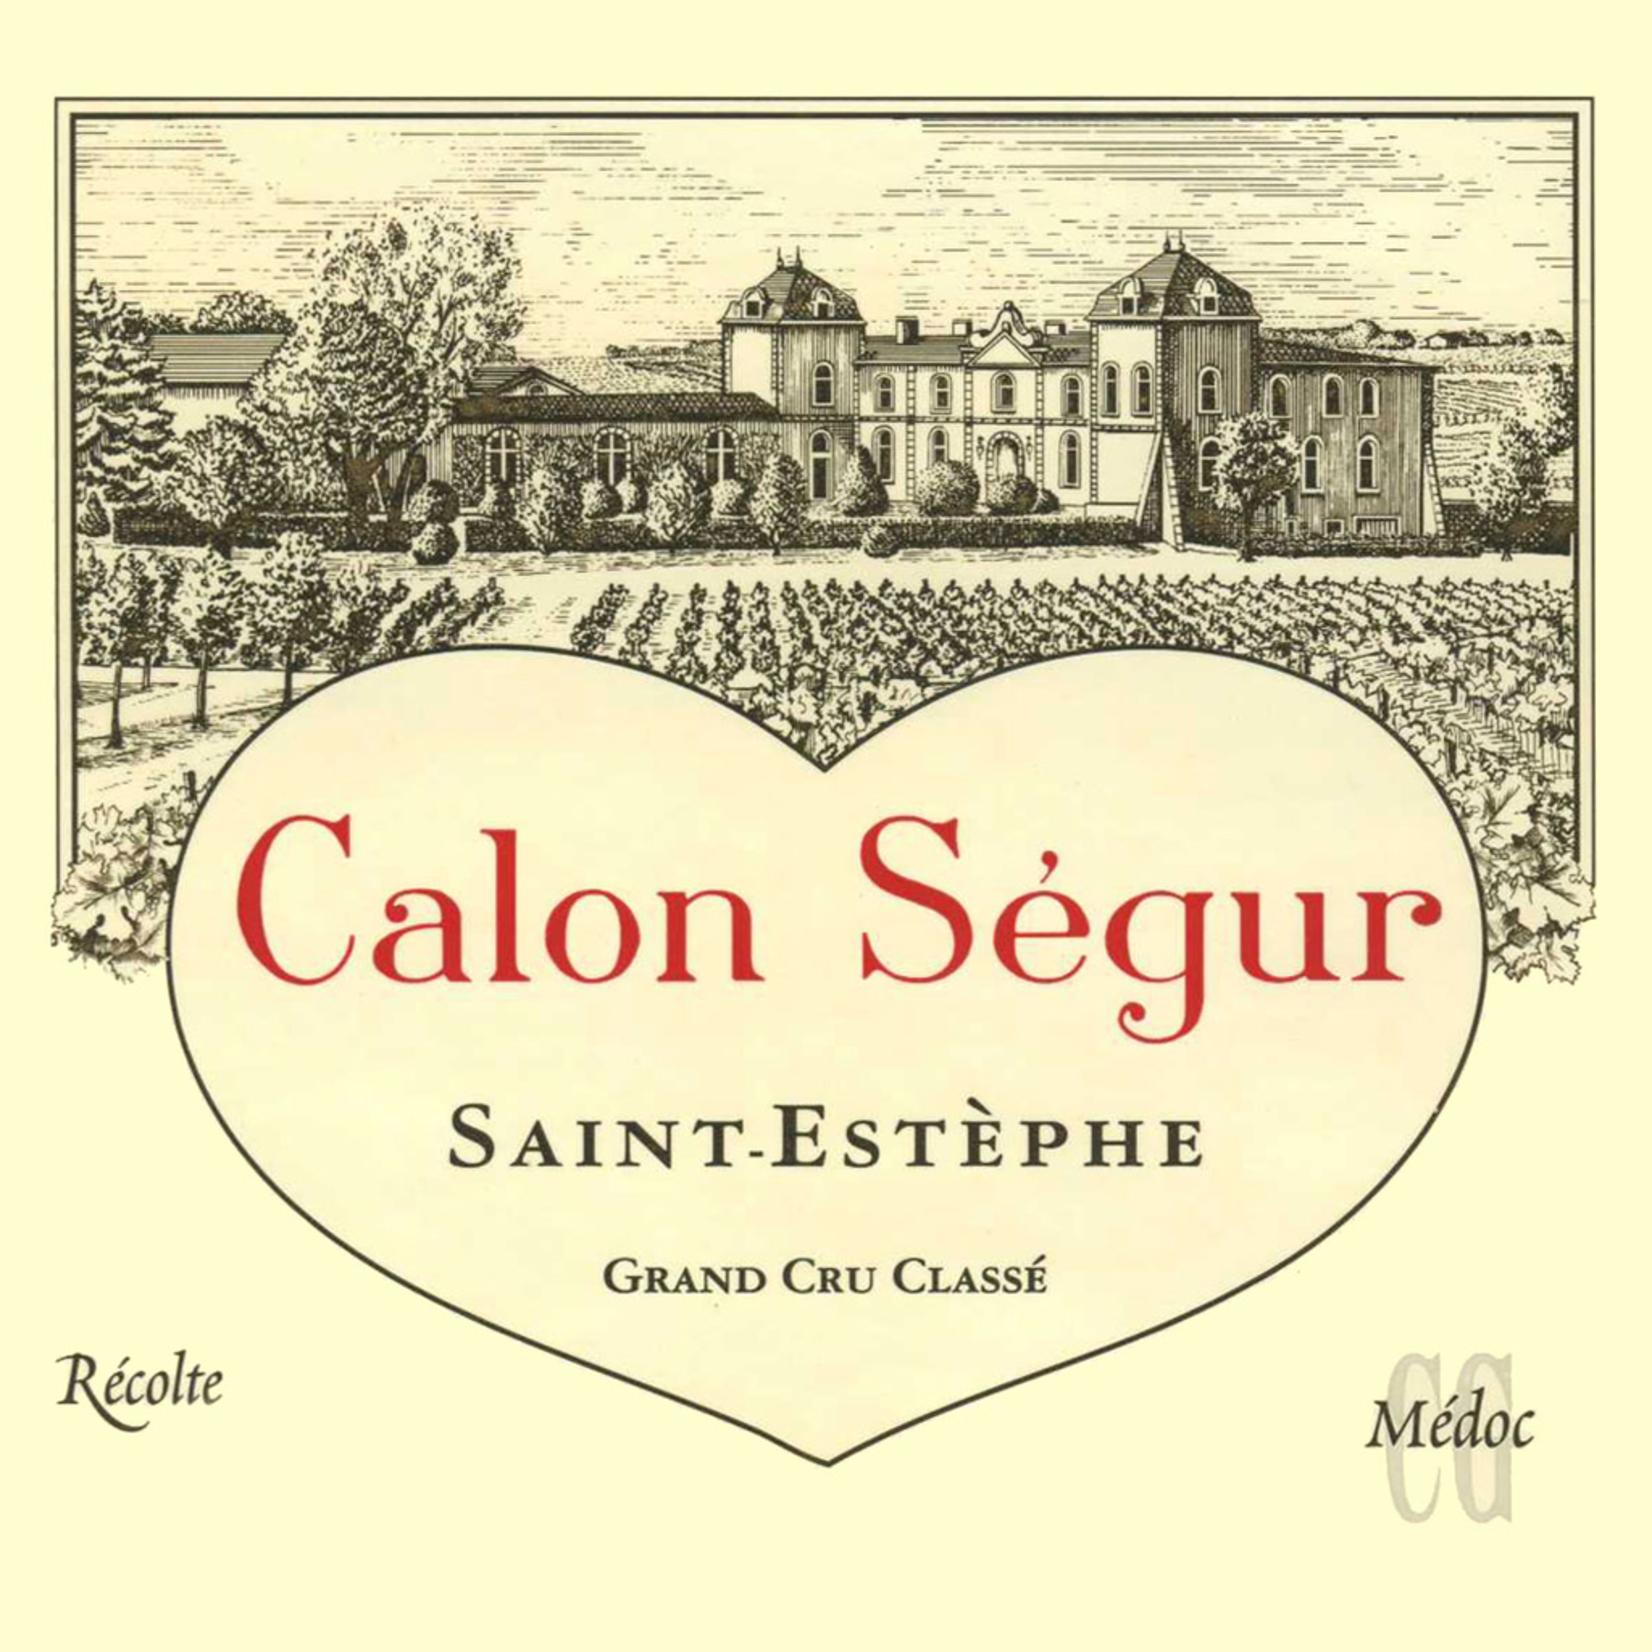 Wine Chateau Calon Segur 2003